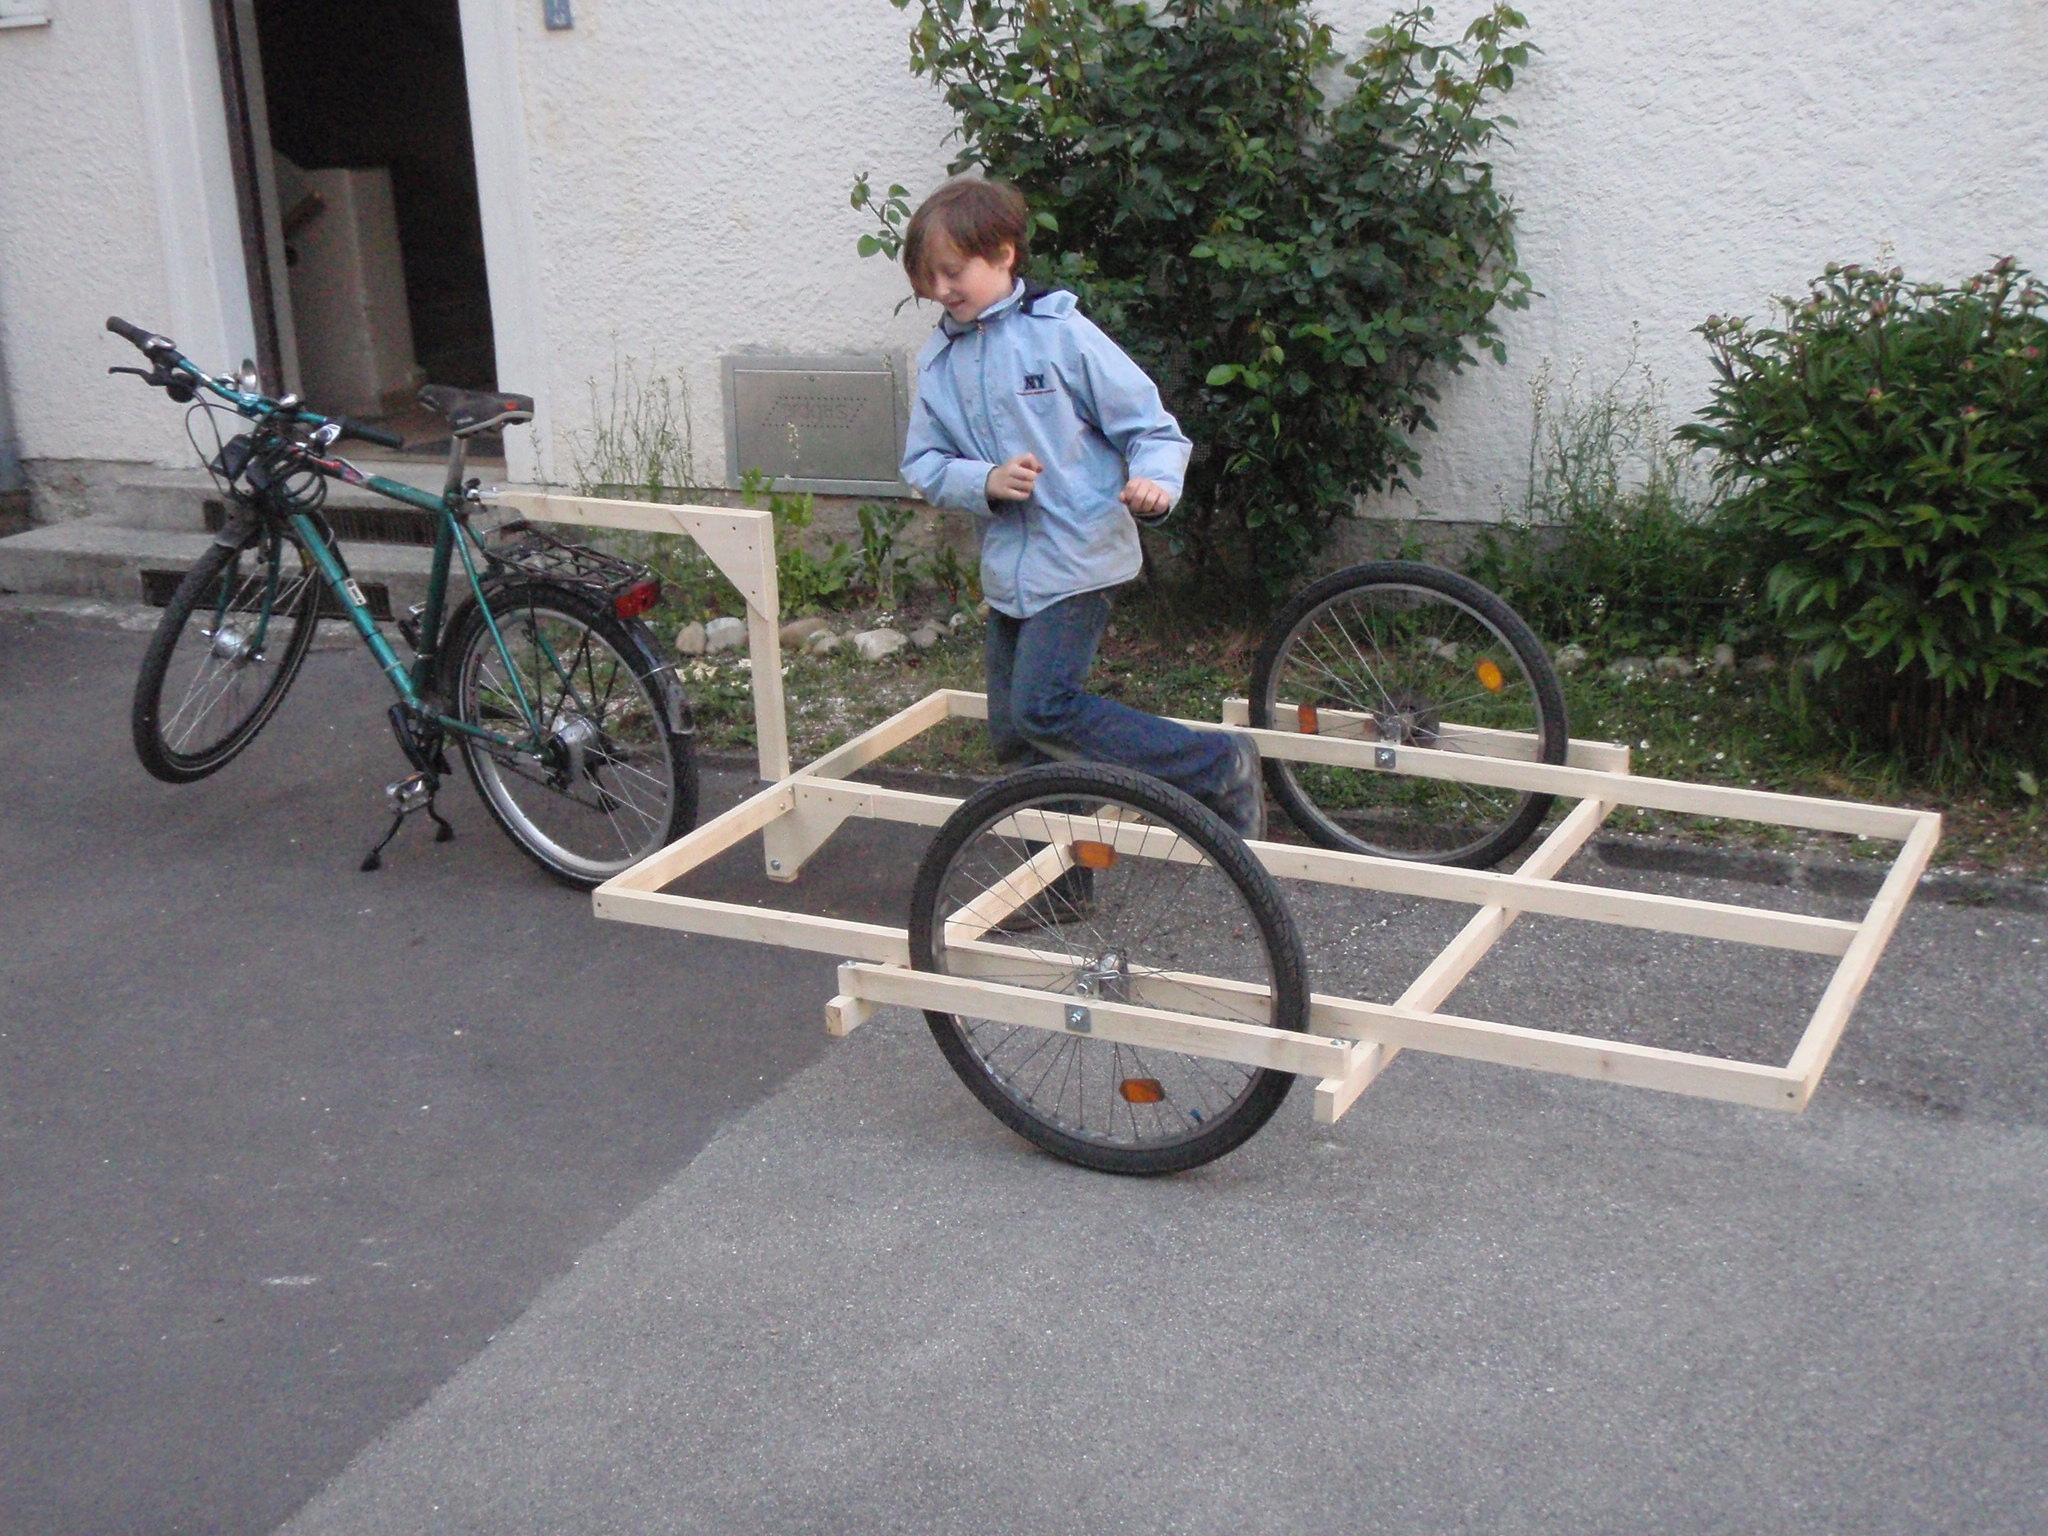 camping dusche selber bauen fahrrad campinganh nger. Black Bedroom Furniture Sets. Home Design Ideas